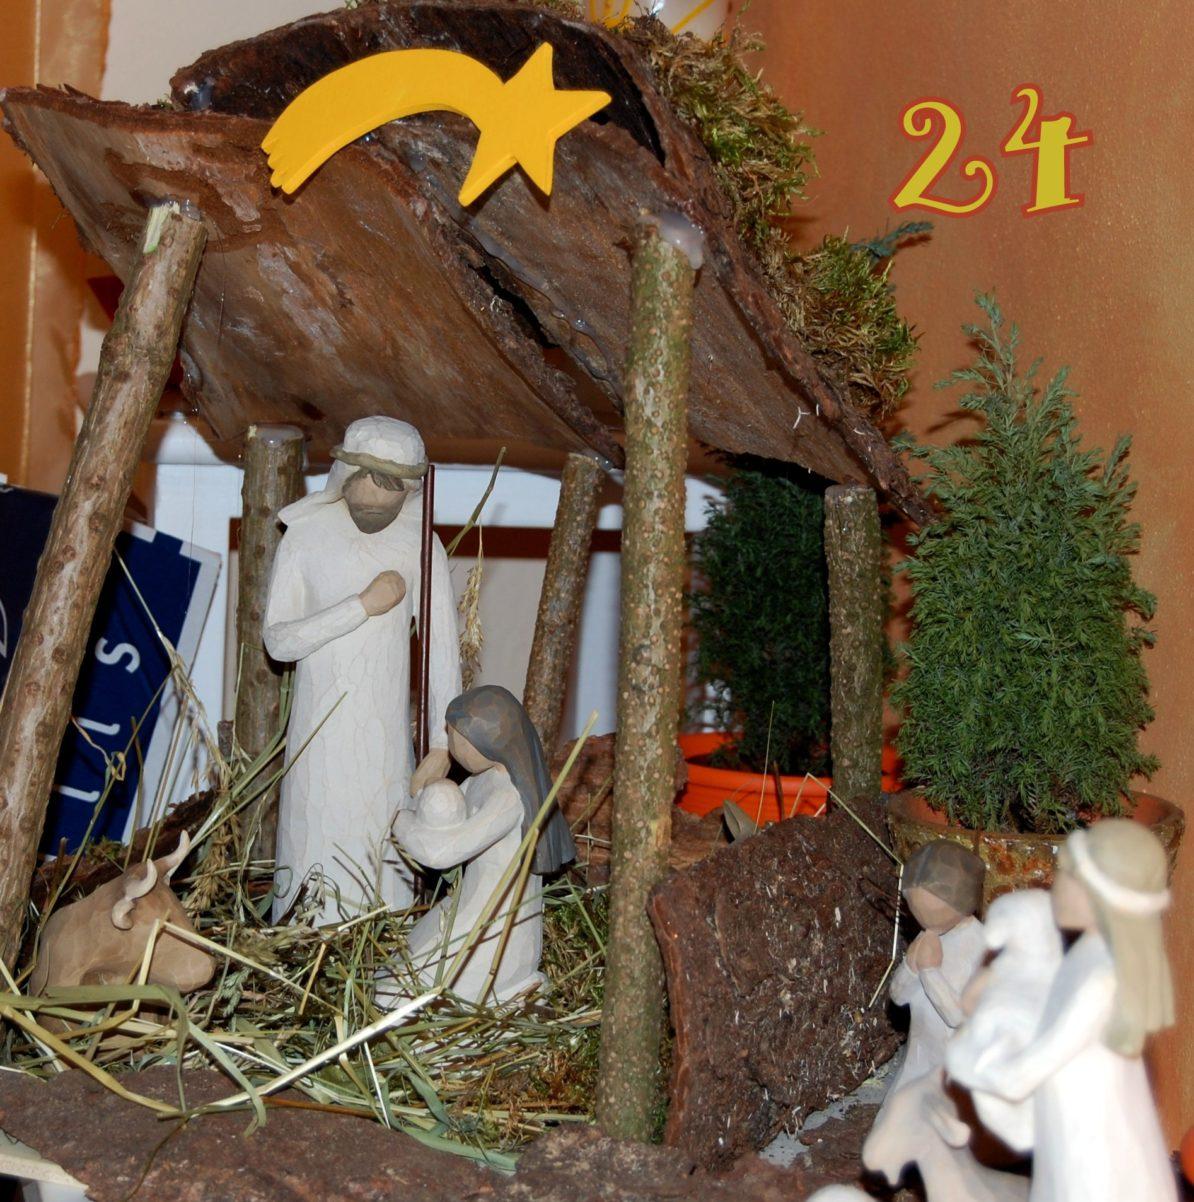 24. Dezember - Adventskalender